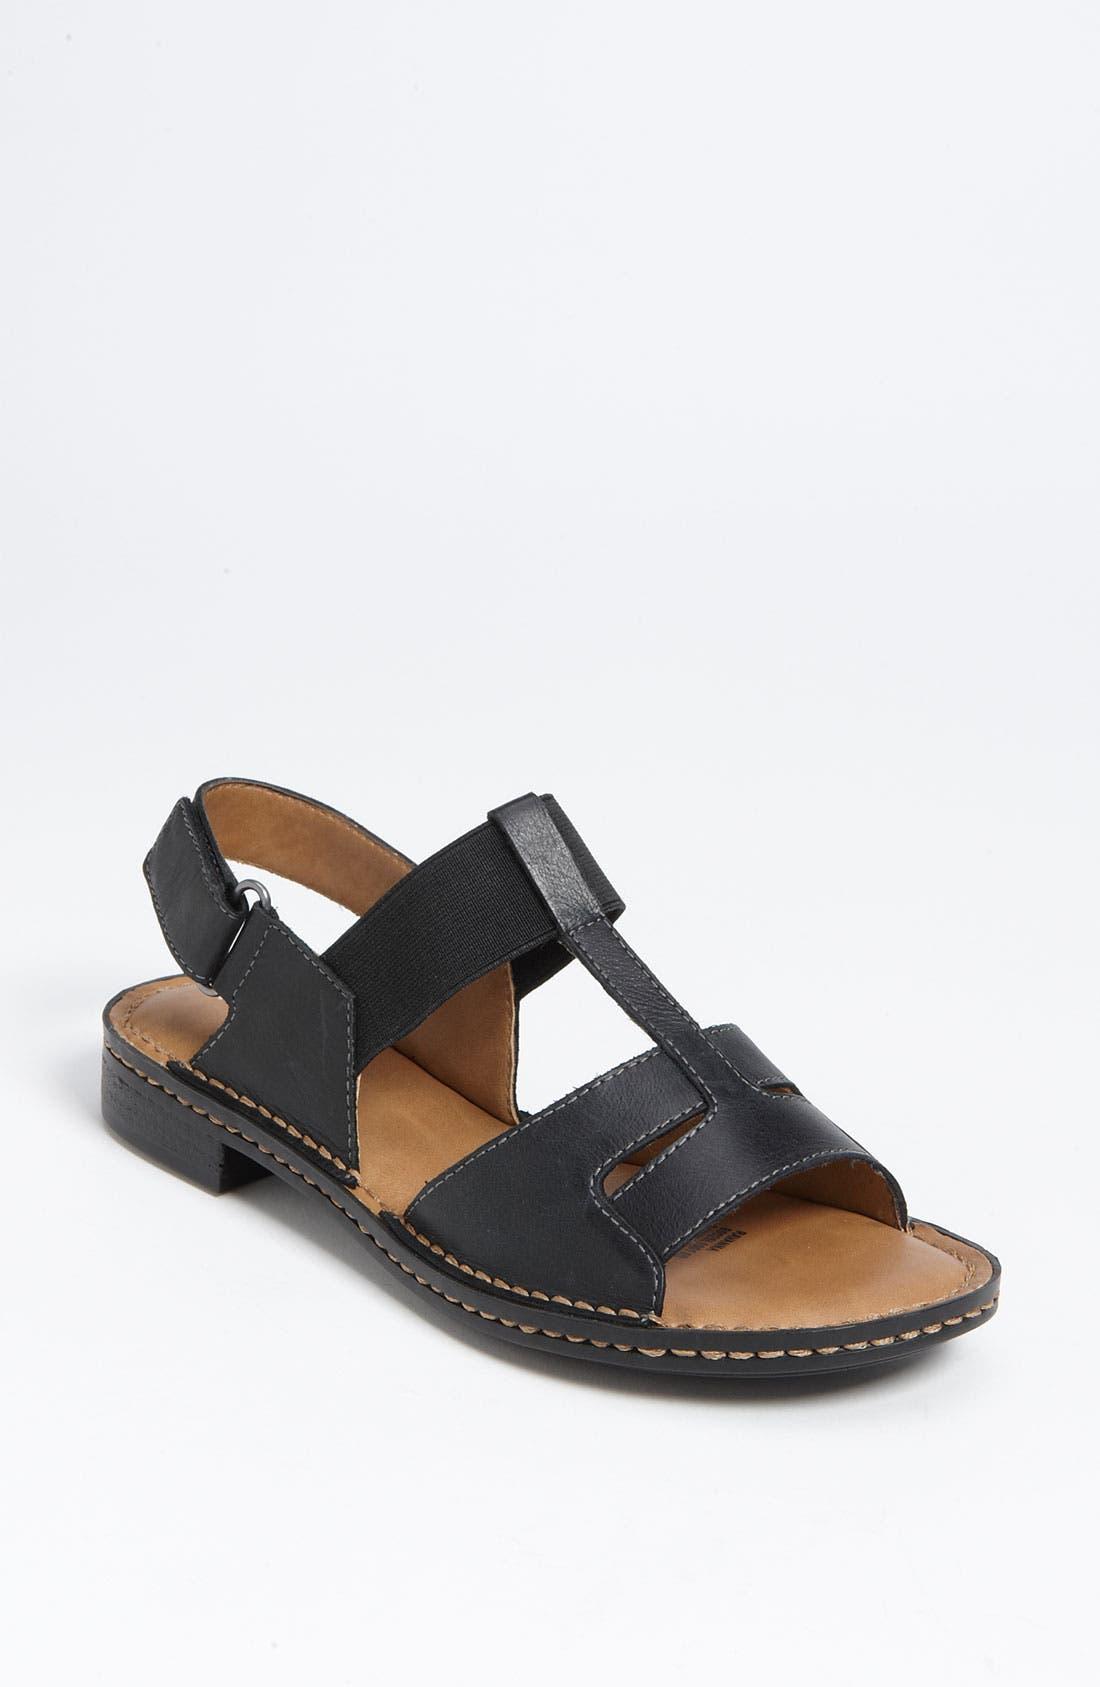 Main Image - Naturalizer 'Ravanna' Sandal